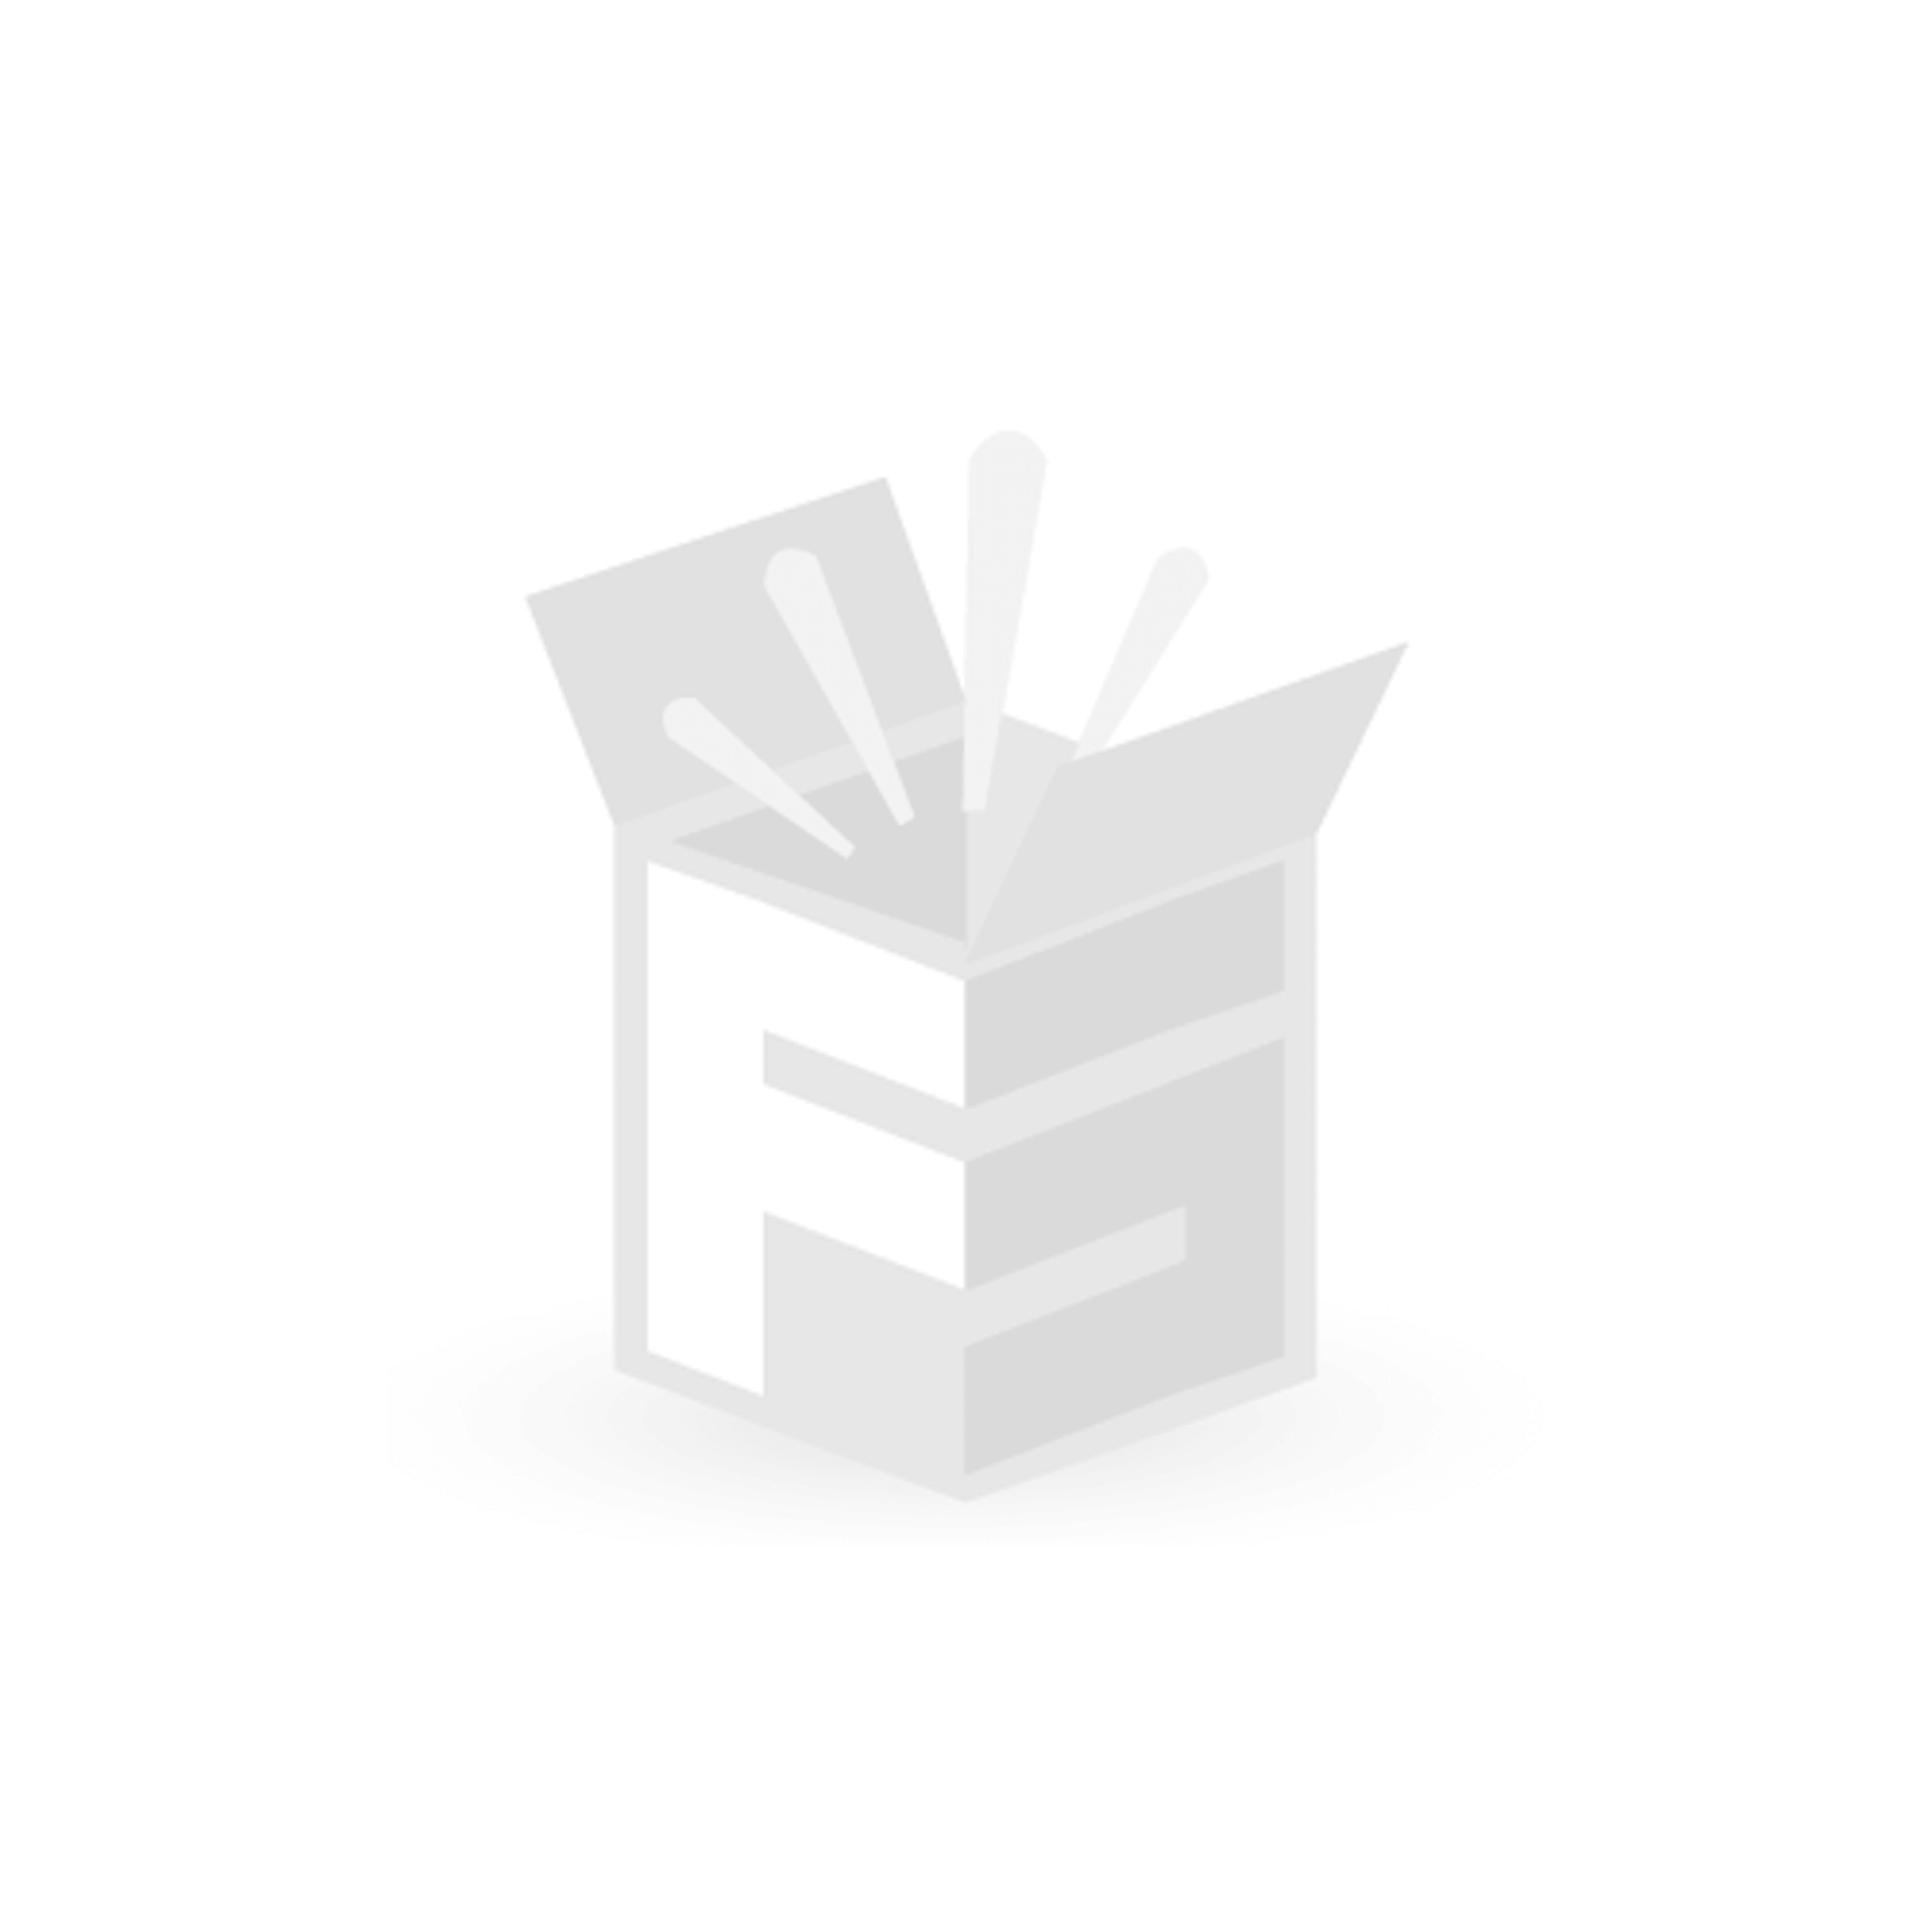 HELSINKI Sideboard MDF décor chêne blanc mat laqué, 180x75x40cm